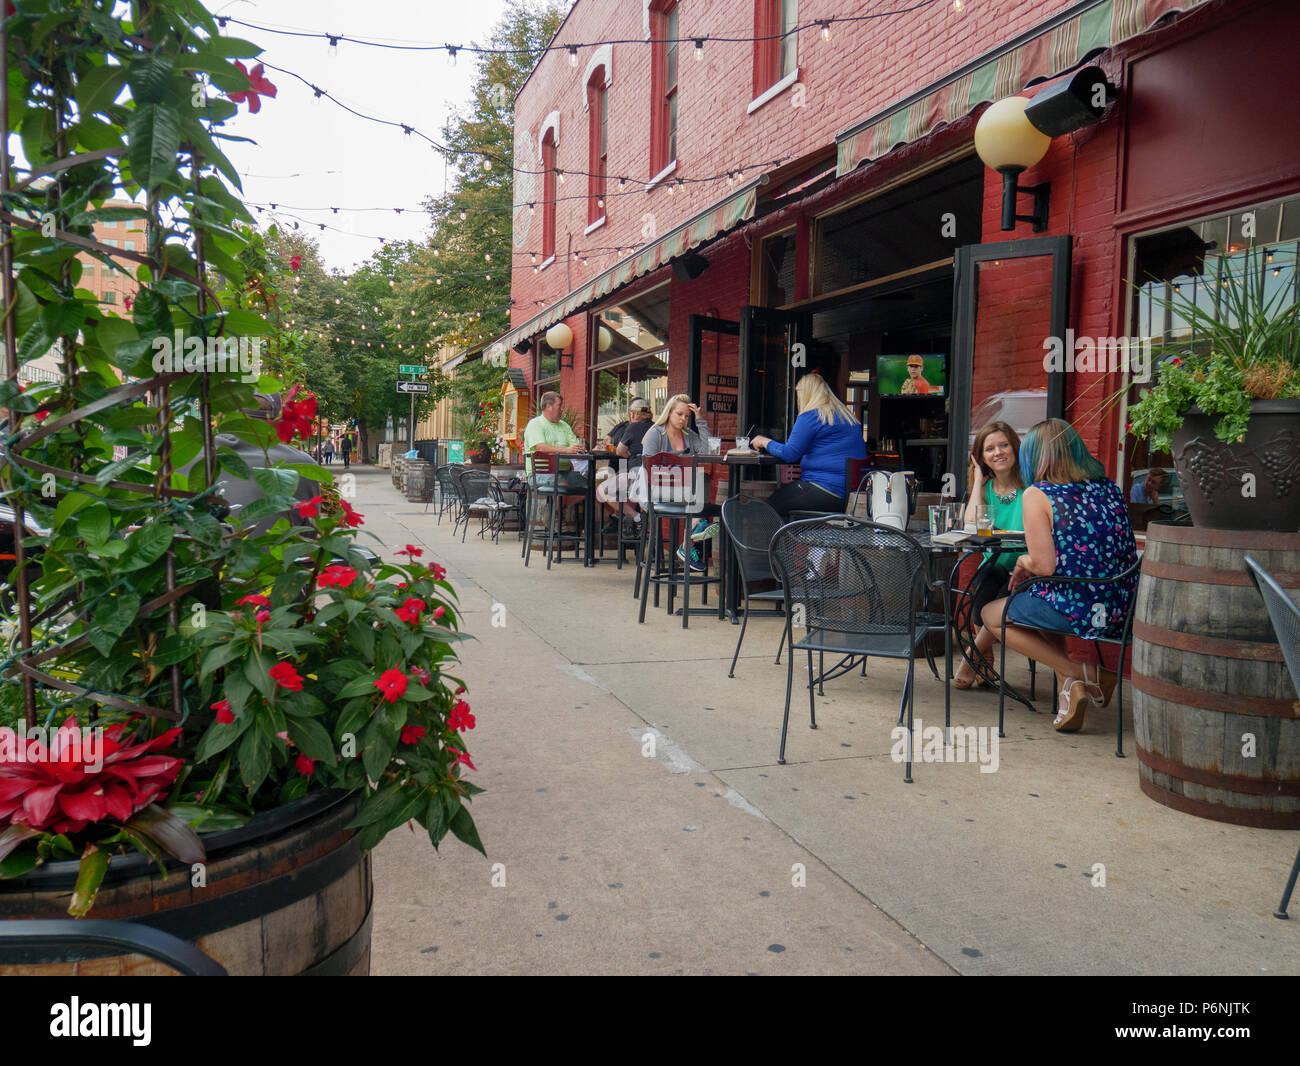 Sidewalk café, Rochester, Minnesota. - Stock Image